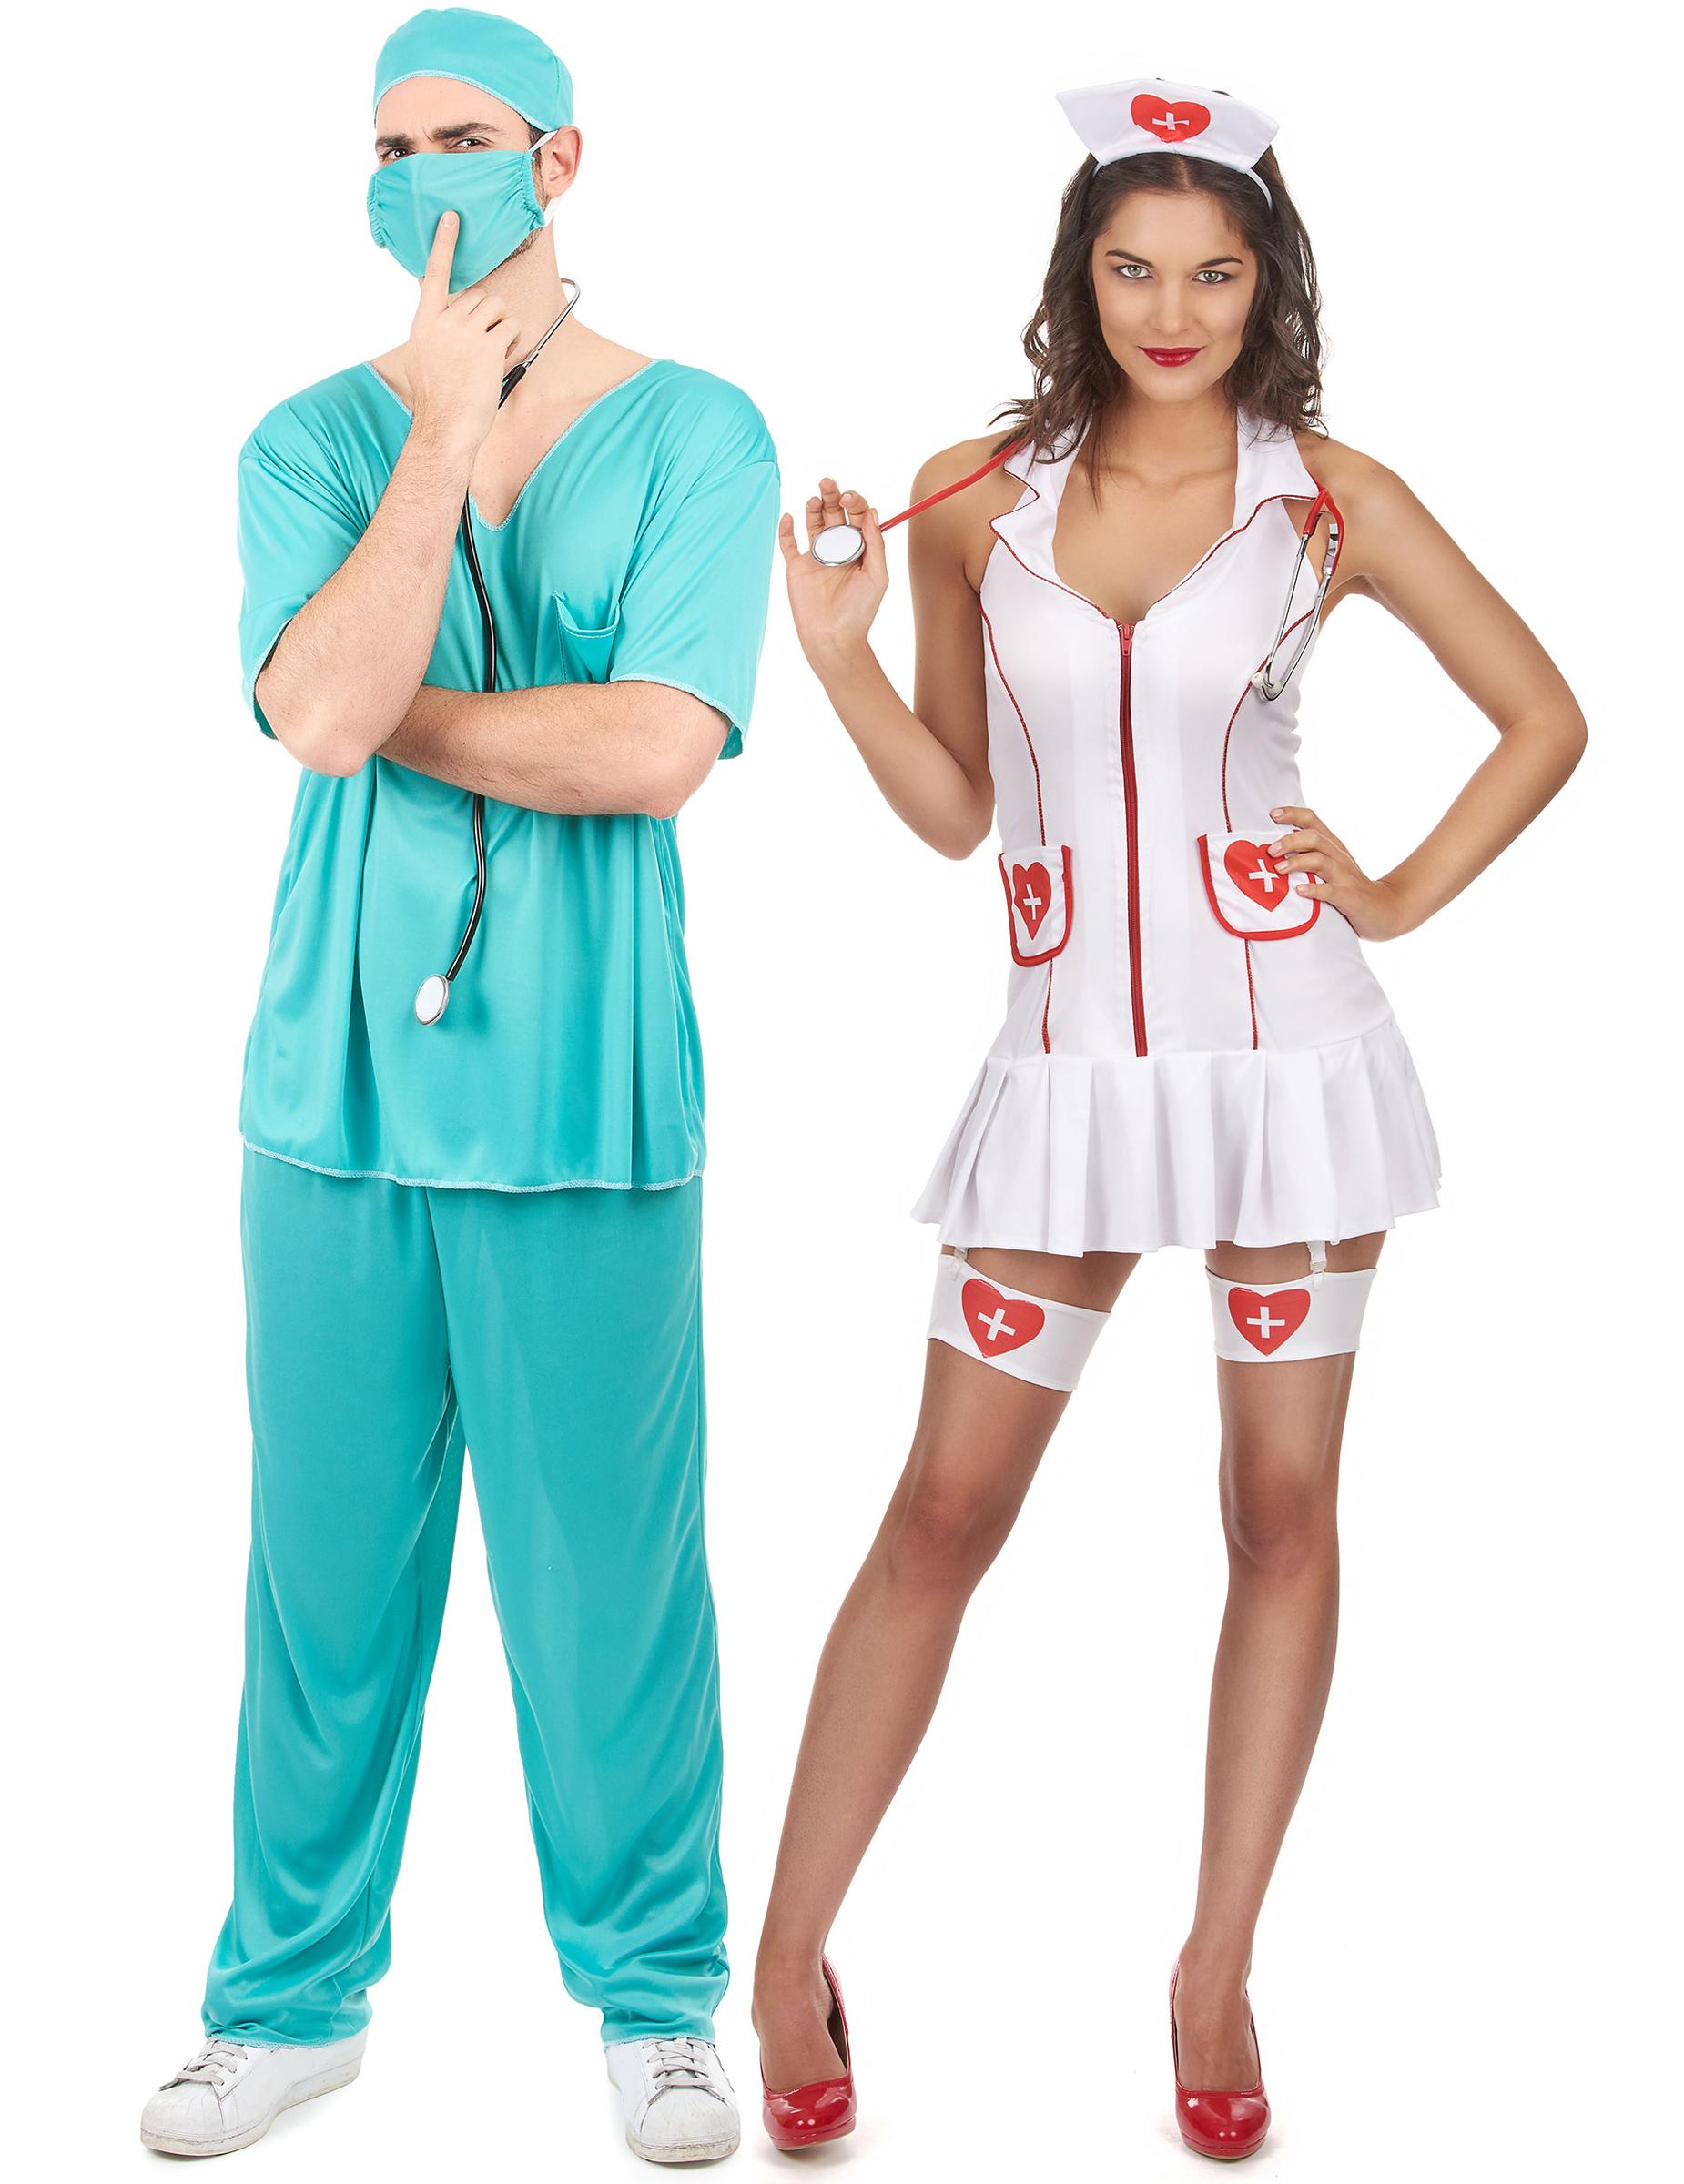 Medico /& Infermiera Costume Di Halloween Costume COPPIE Scrubs Uniforme Medium